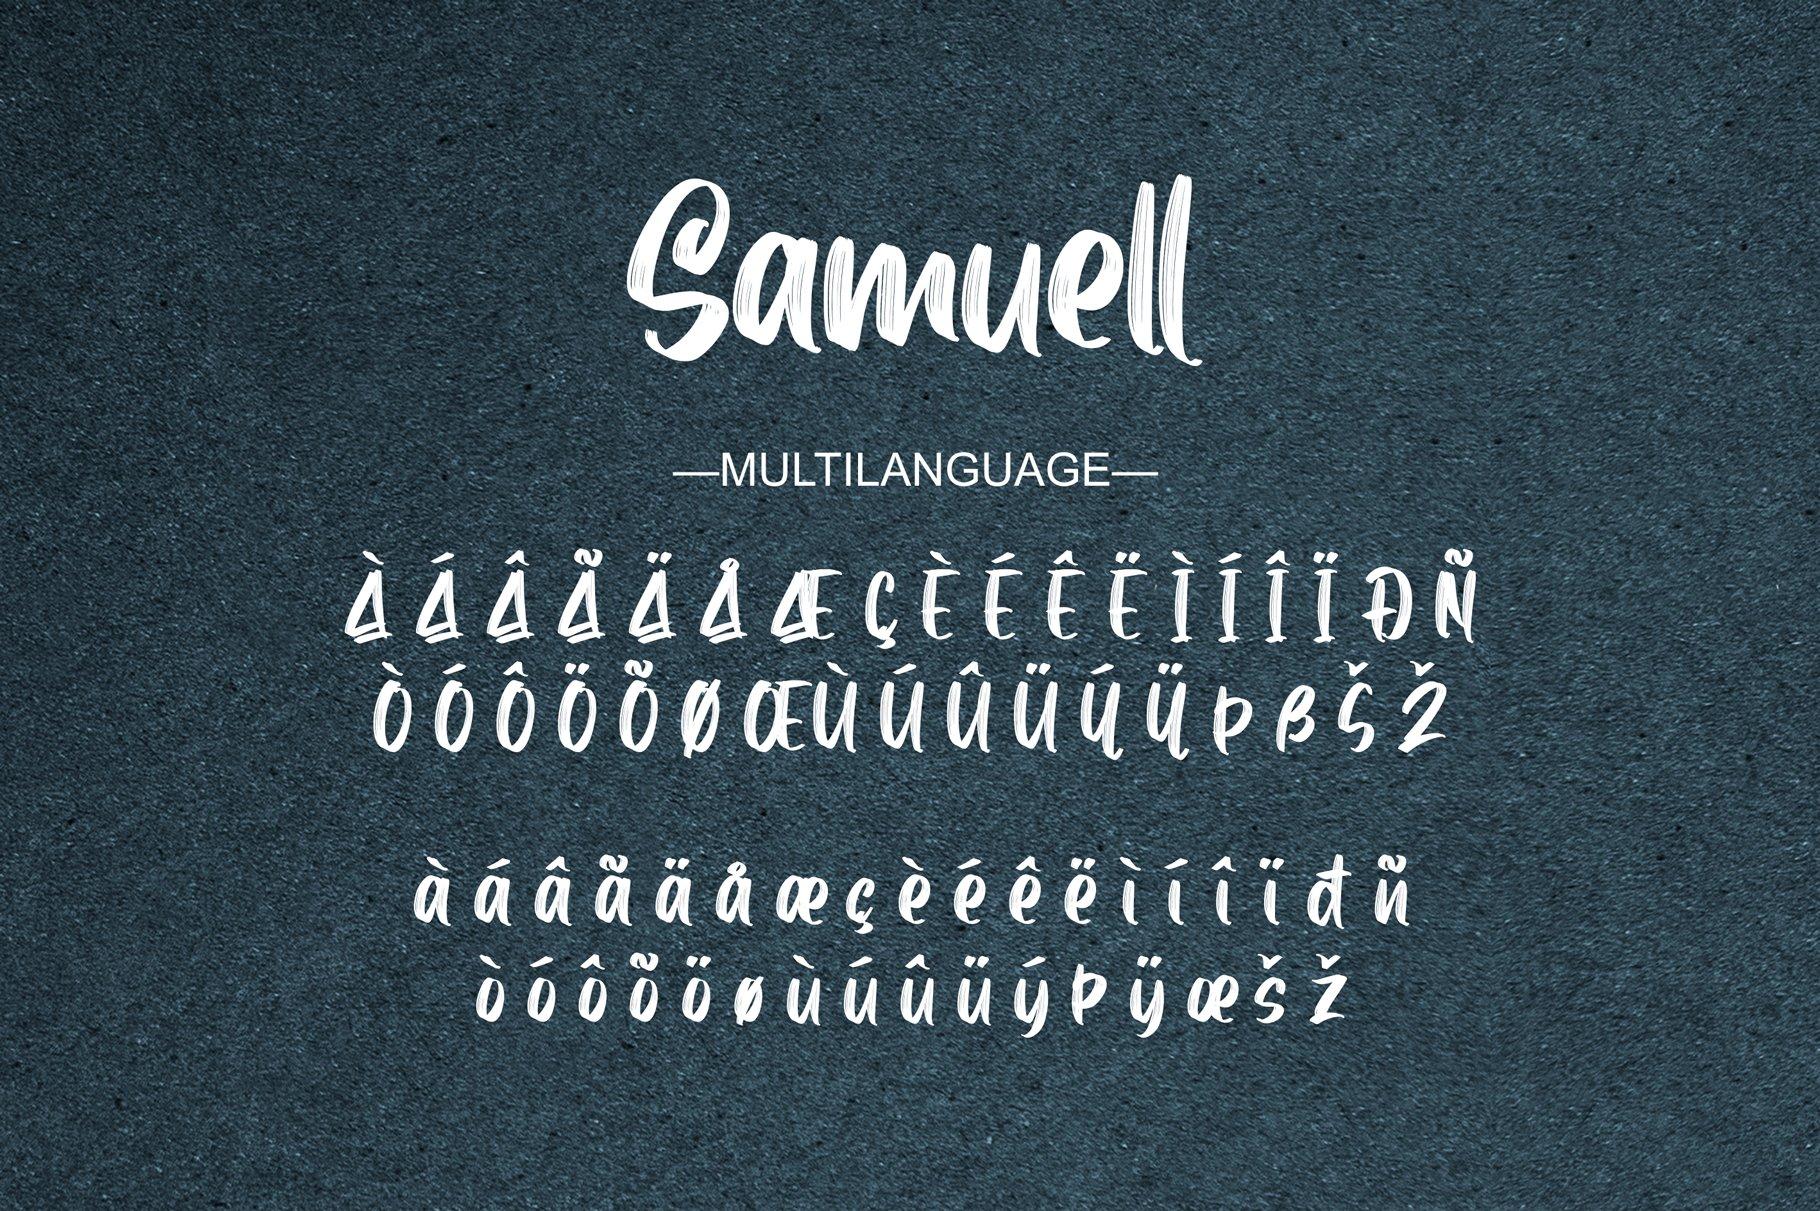 Samuell example image 11